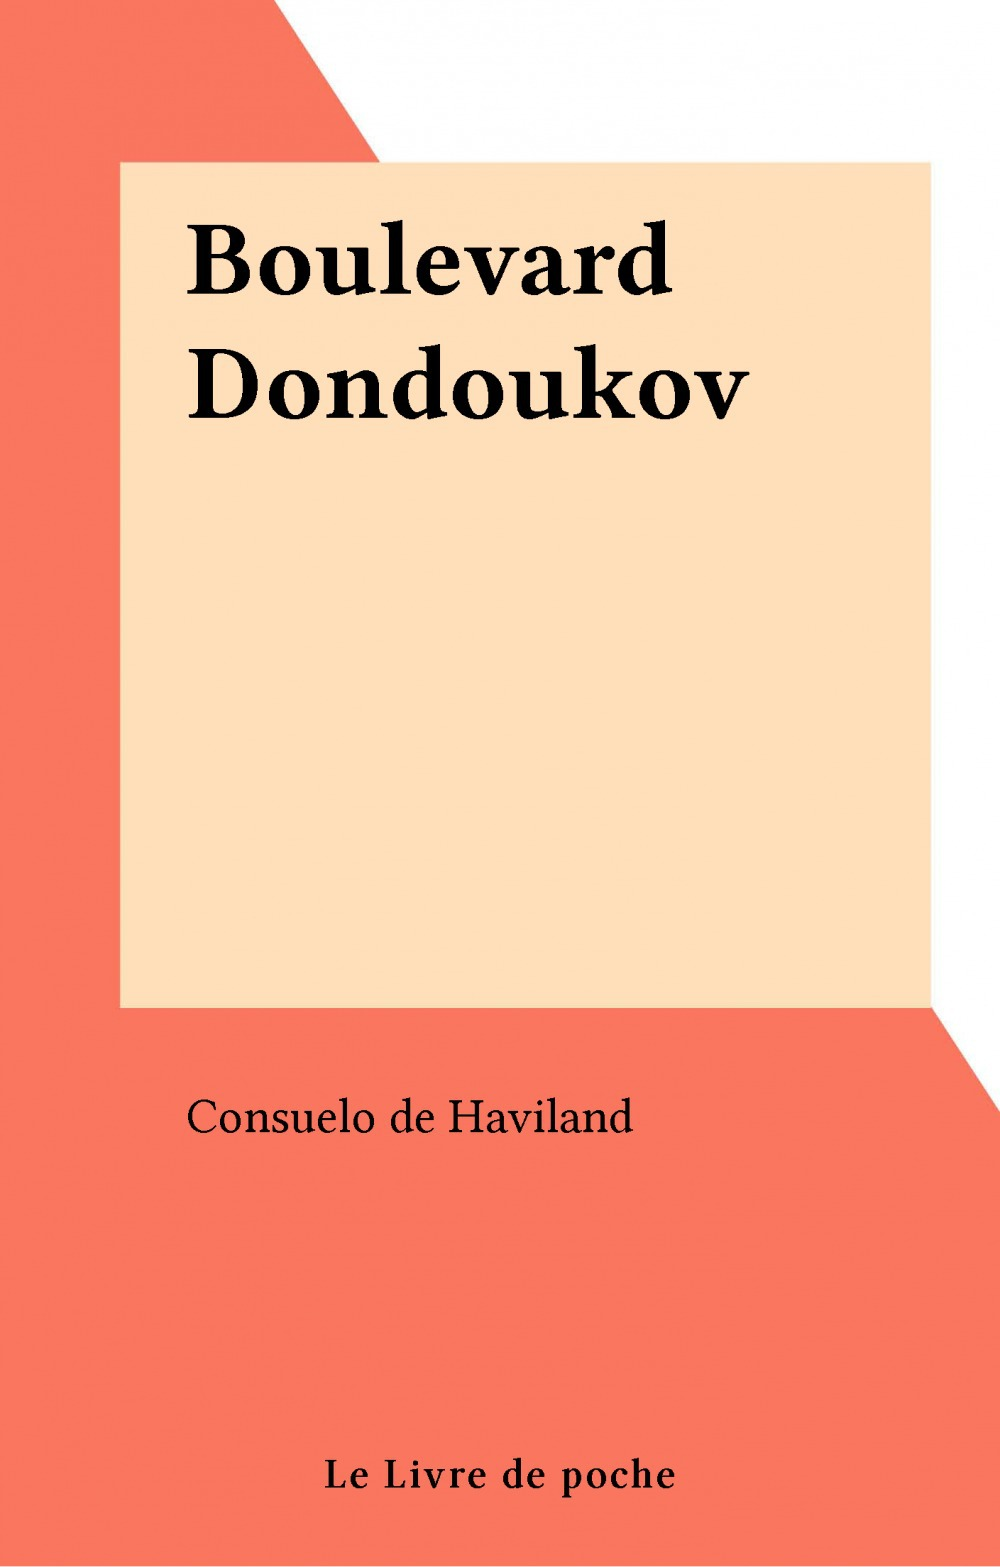 Boulevard dondoukov